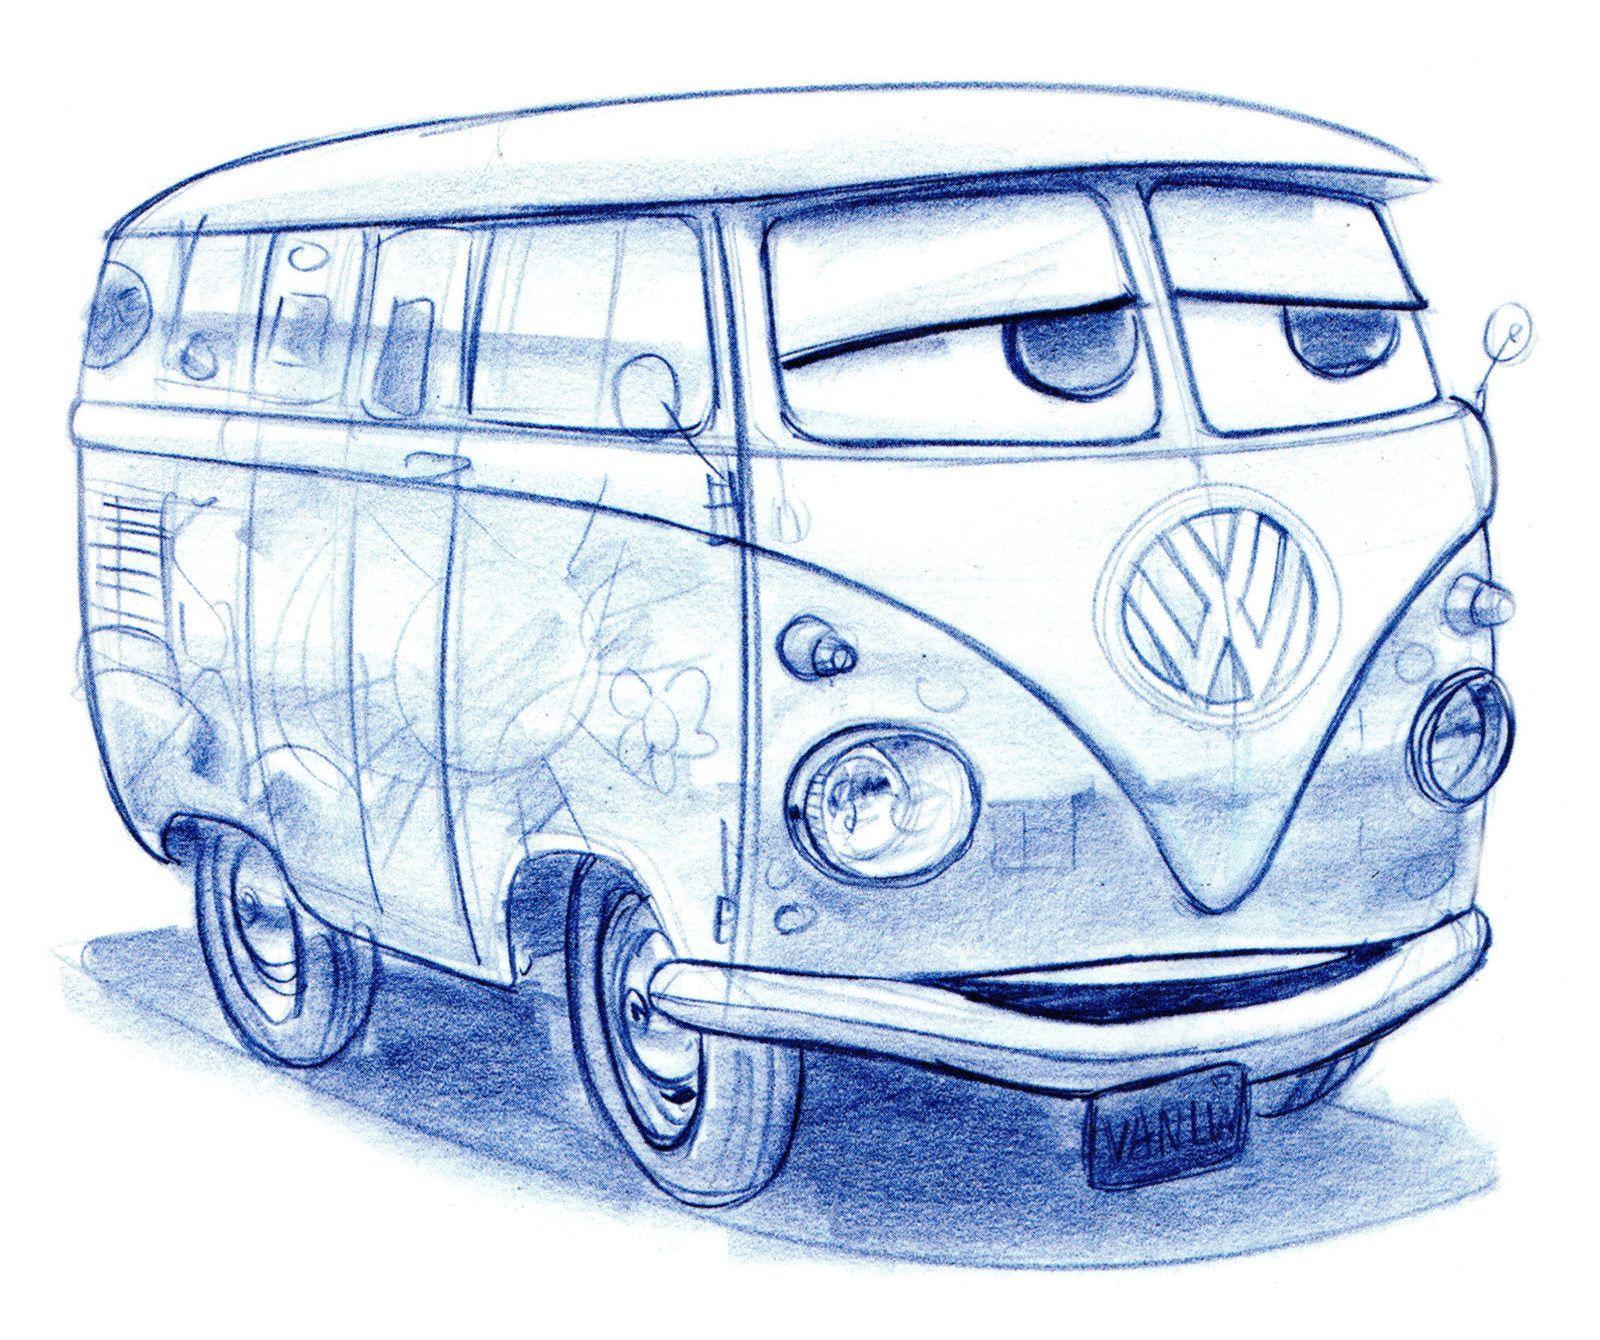 1600x1340 Pin By Chris Perlman On Beach Rules Cars, Draw